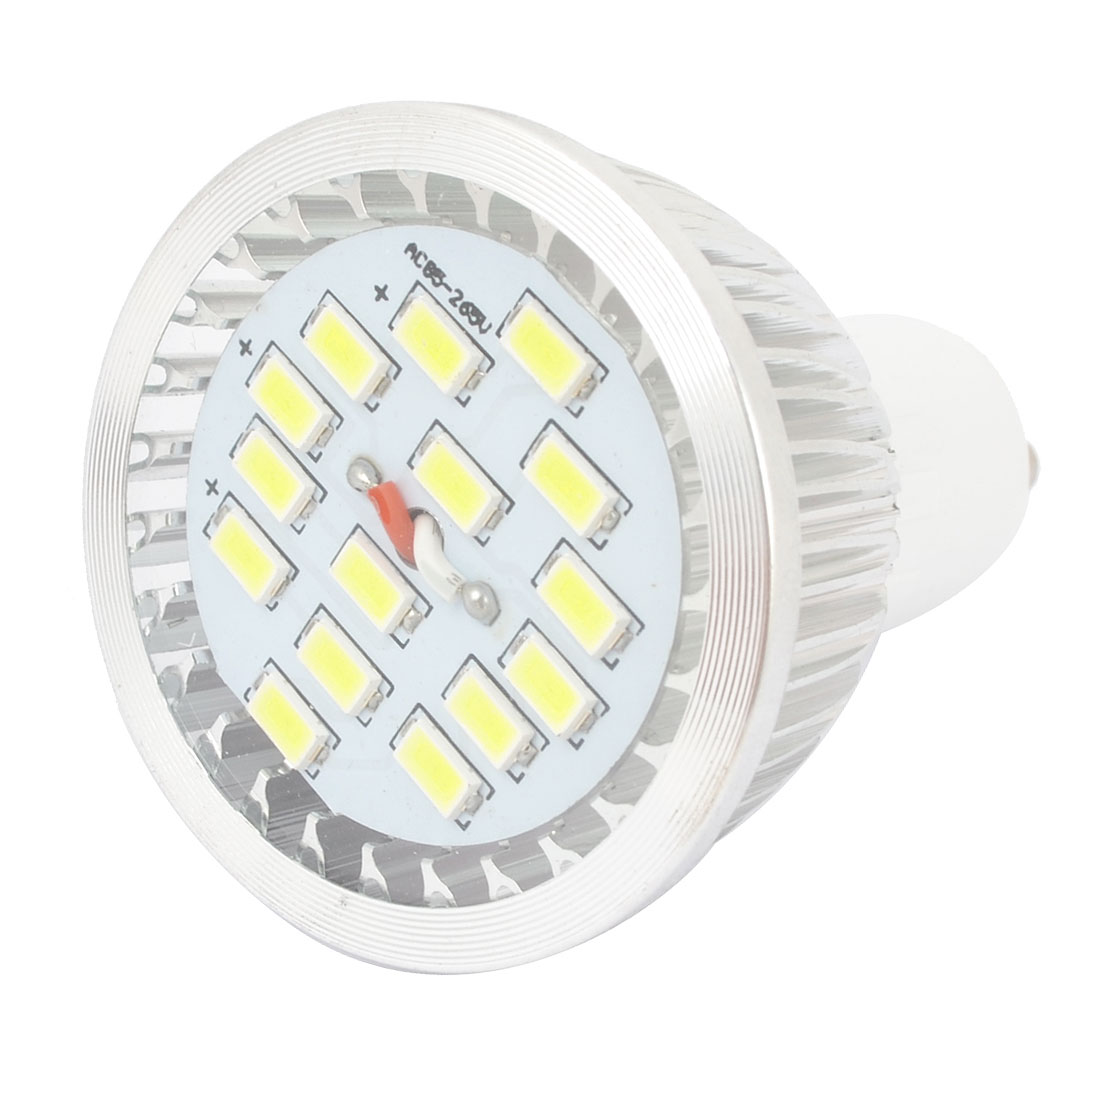 White 7W GU10 Socket 5730 SMD 15-LED COB Spotlight Bulb Lamp AC85-265V